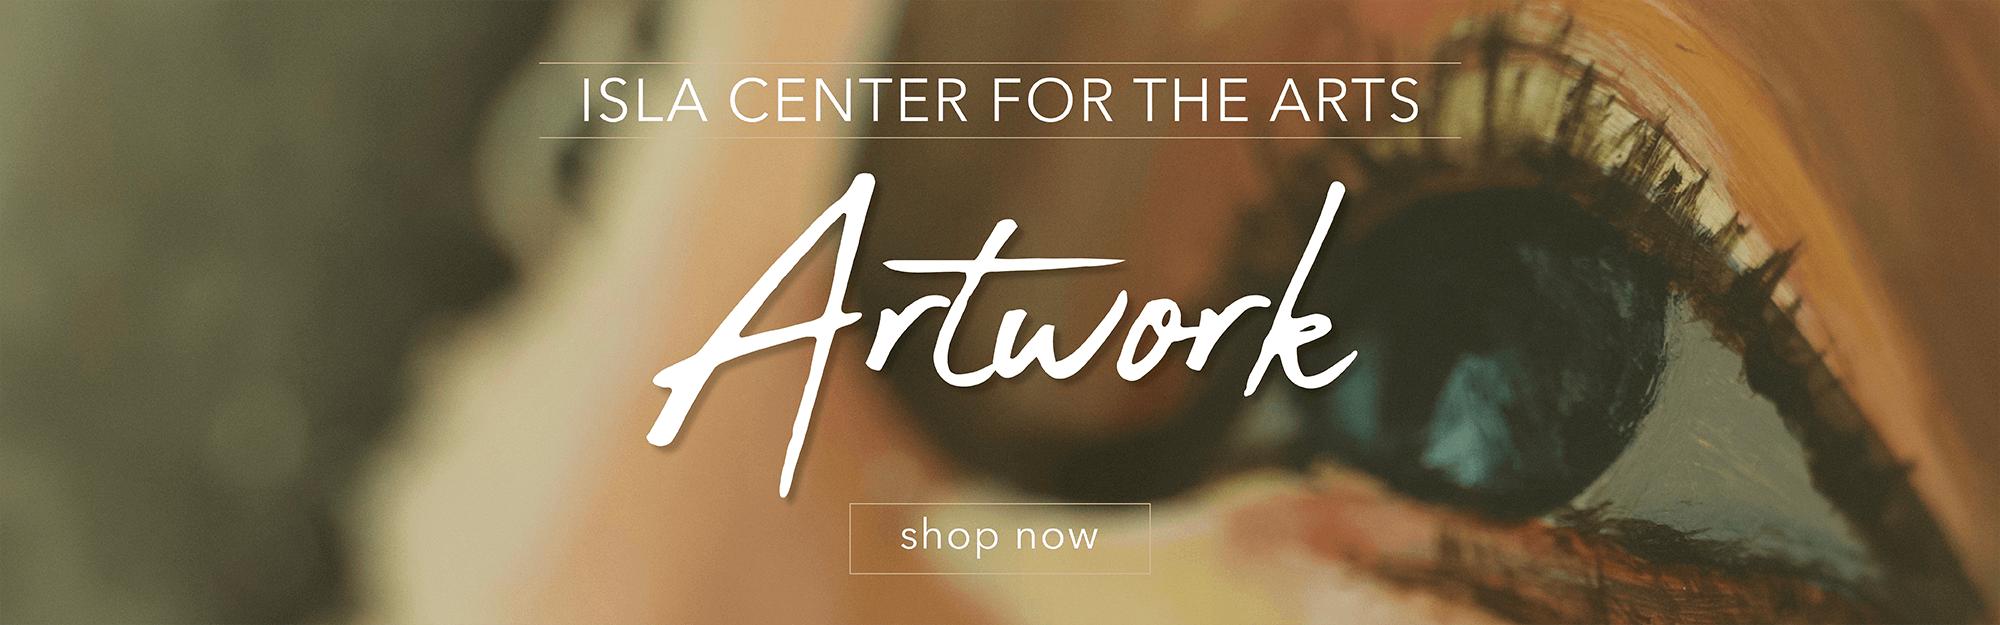 ISLA Center for the Arts Artwork